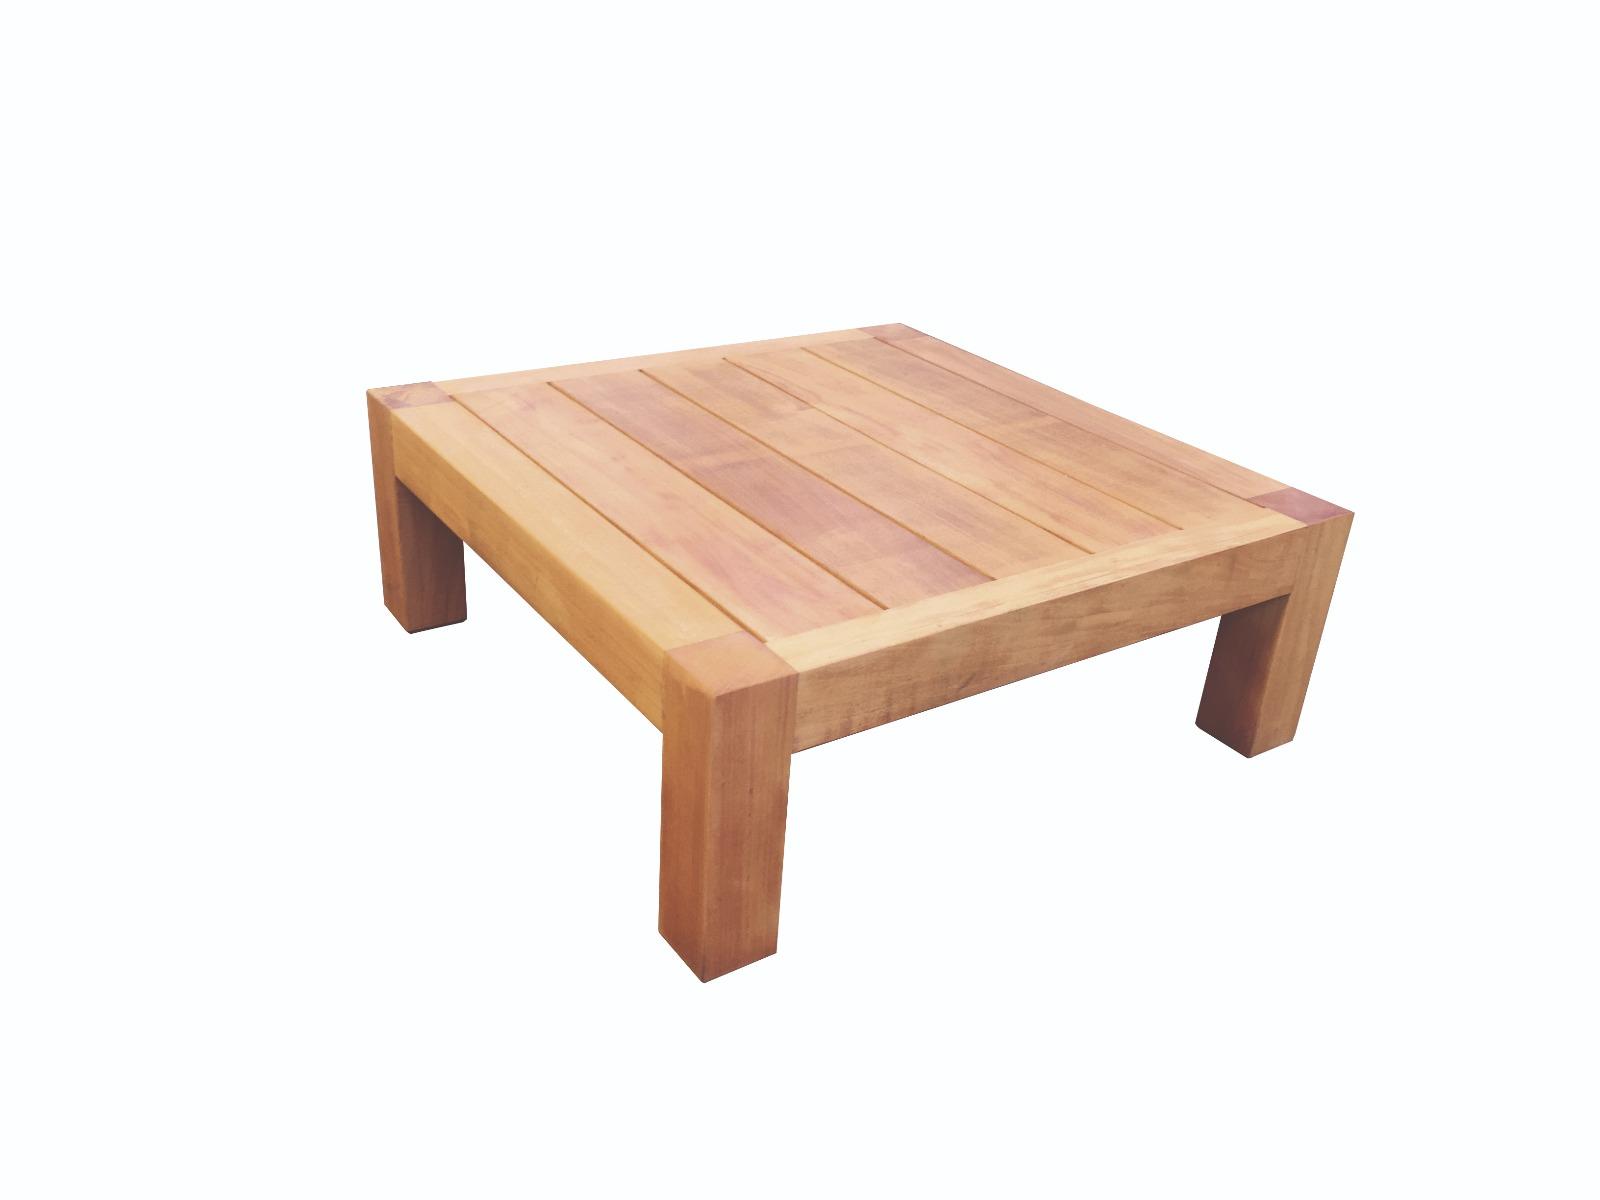 Loungetisch hartholz